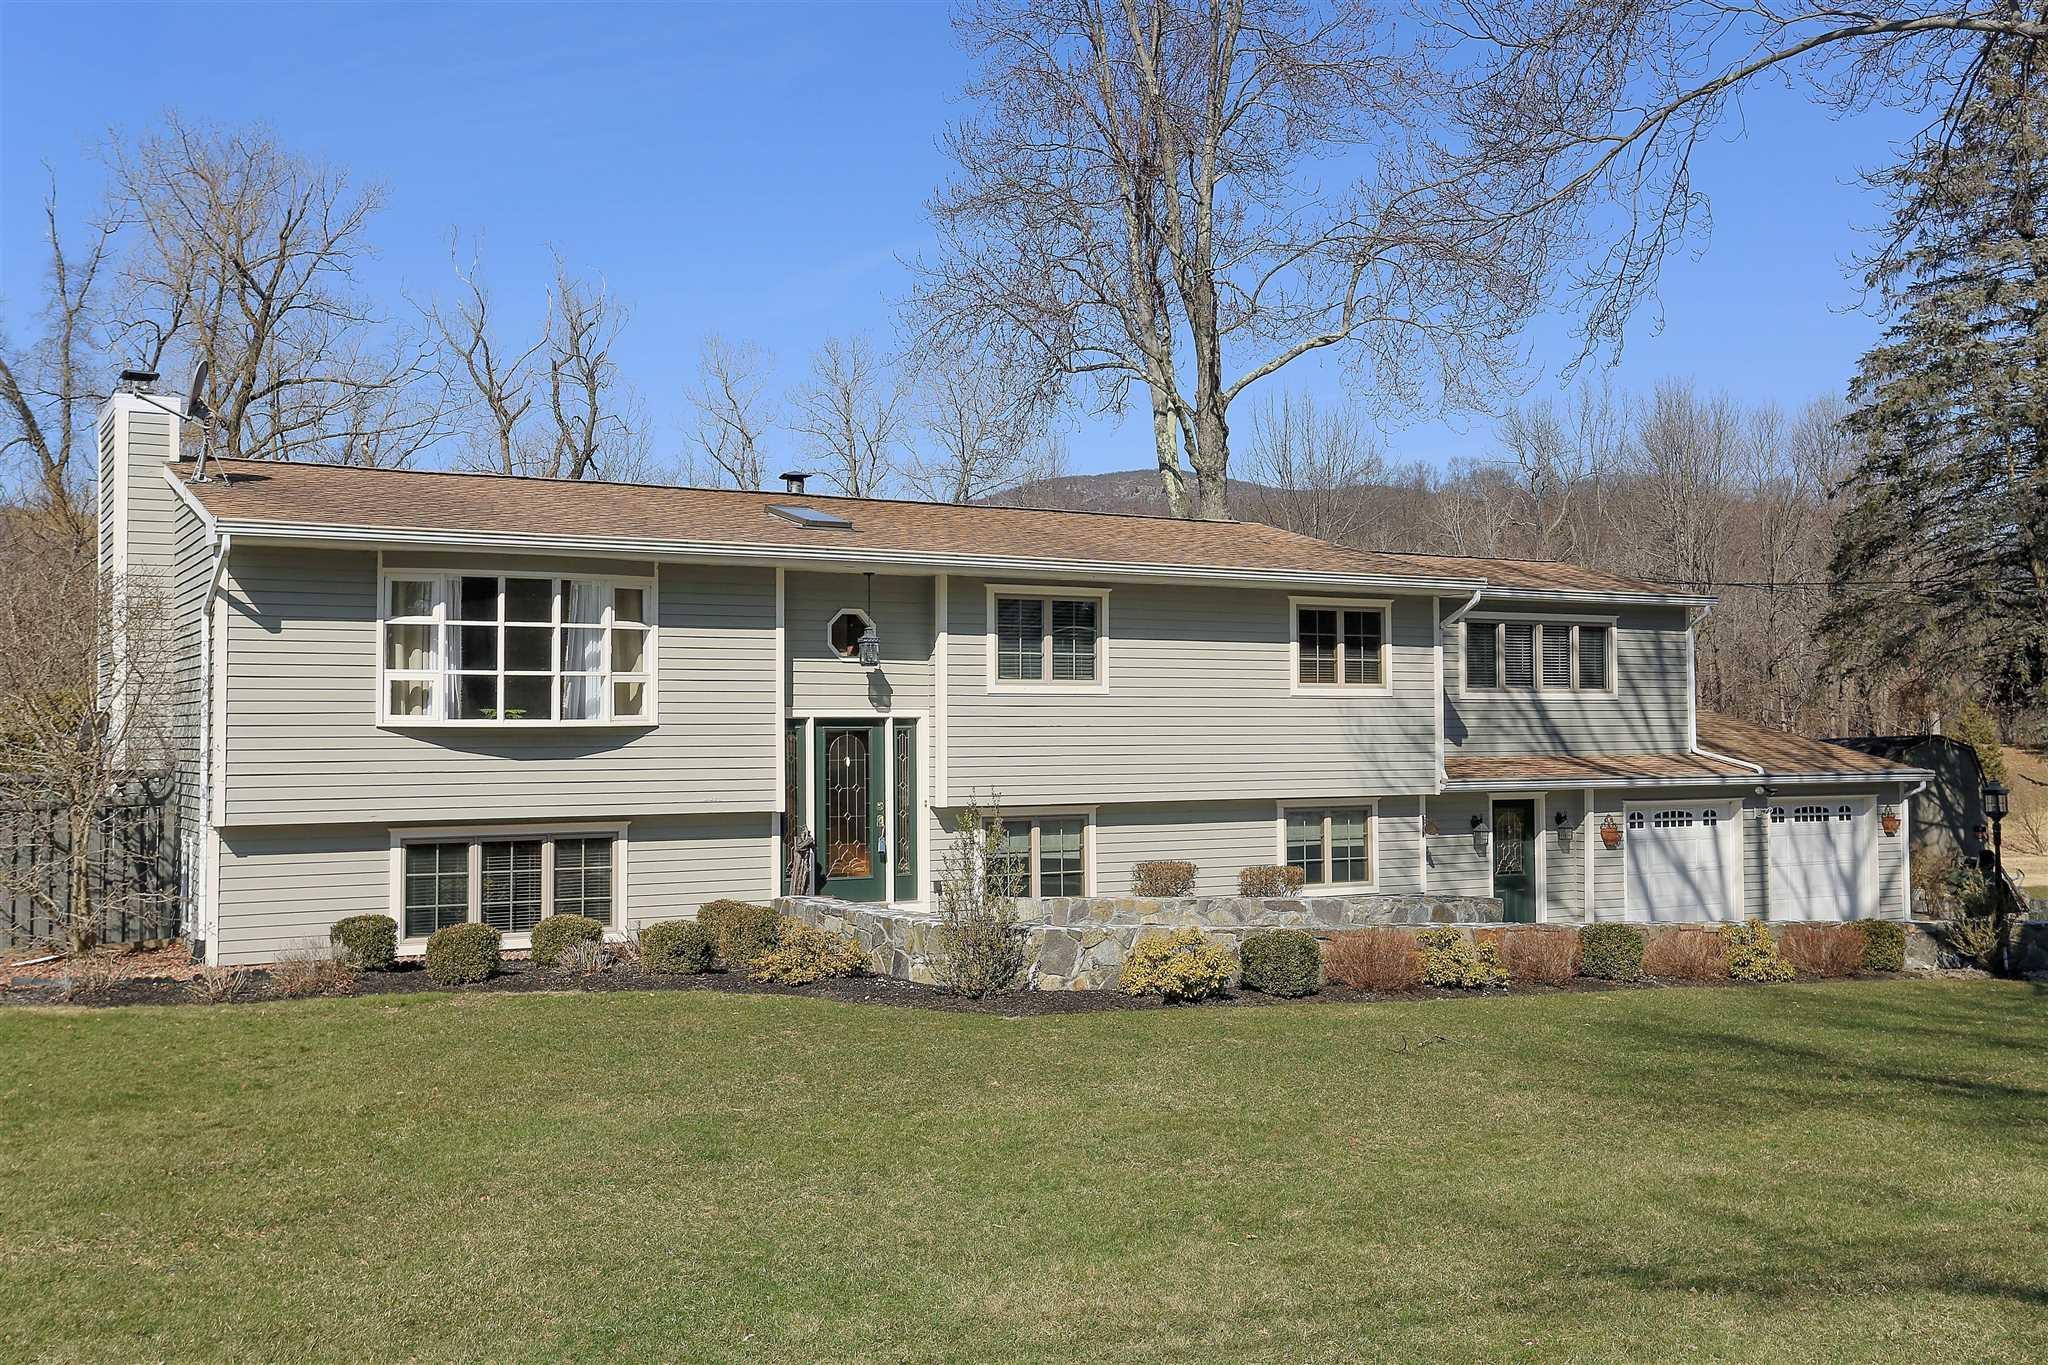 Single Family Home for Sale at 61 HIRAM 61 HIRAM Philipstown, New York 10516 United States